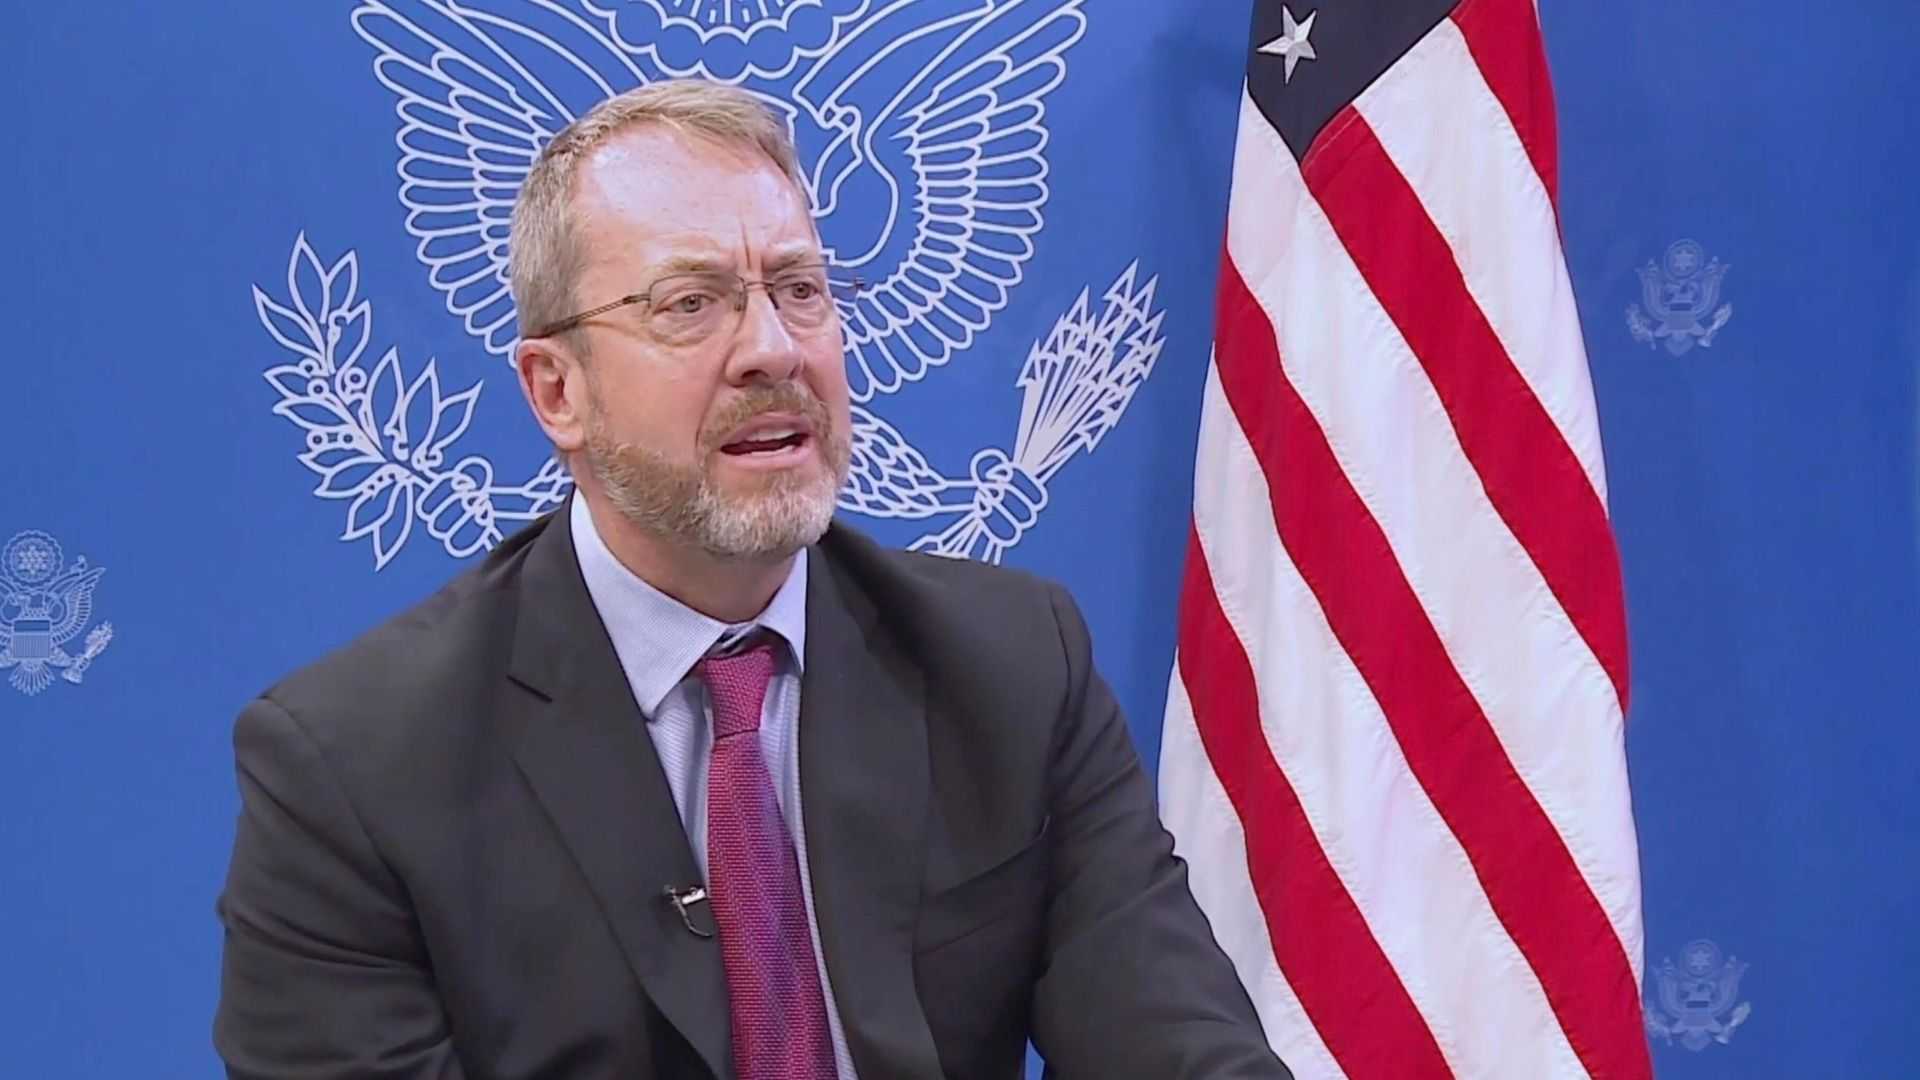 EEUU nombró a James Story embajador para Venezuela